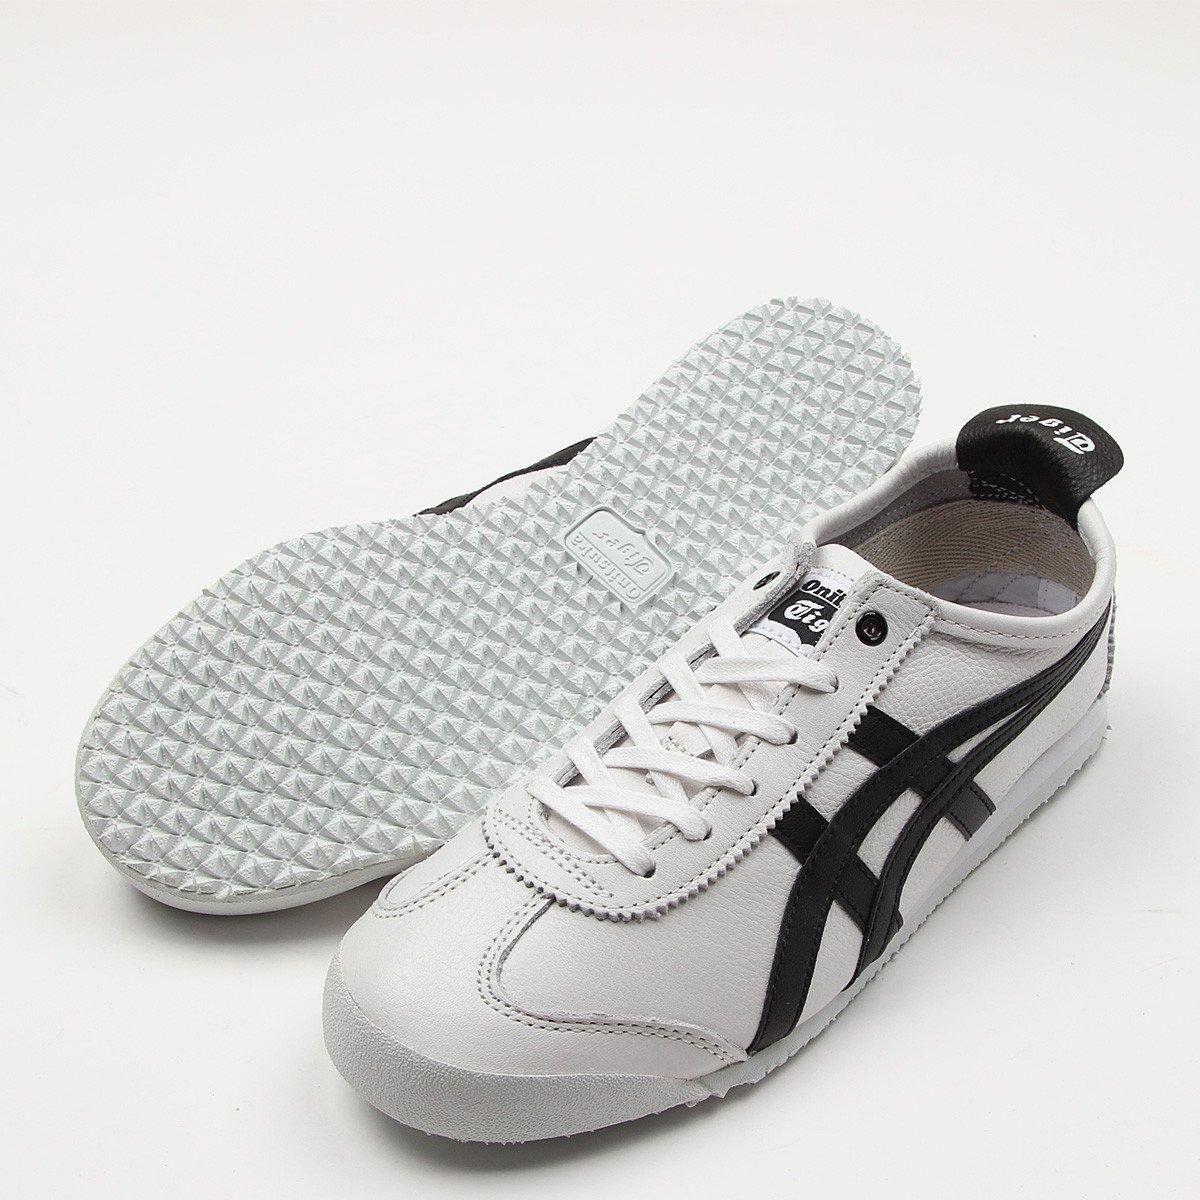 sports shoes 4ff07 bf14a 멕시코 66 / 화이트-블랙 / D508K / MEXICO 66 / WHITE-BLACK ...